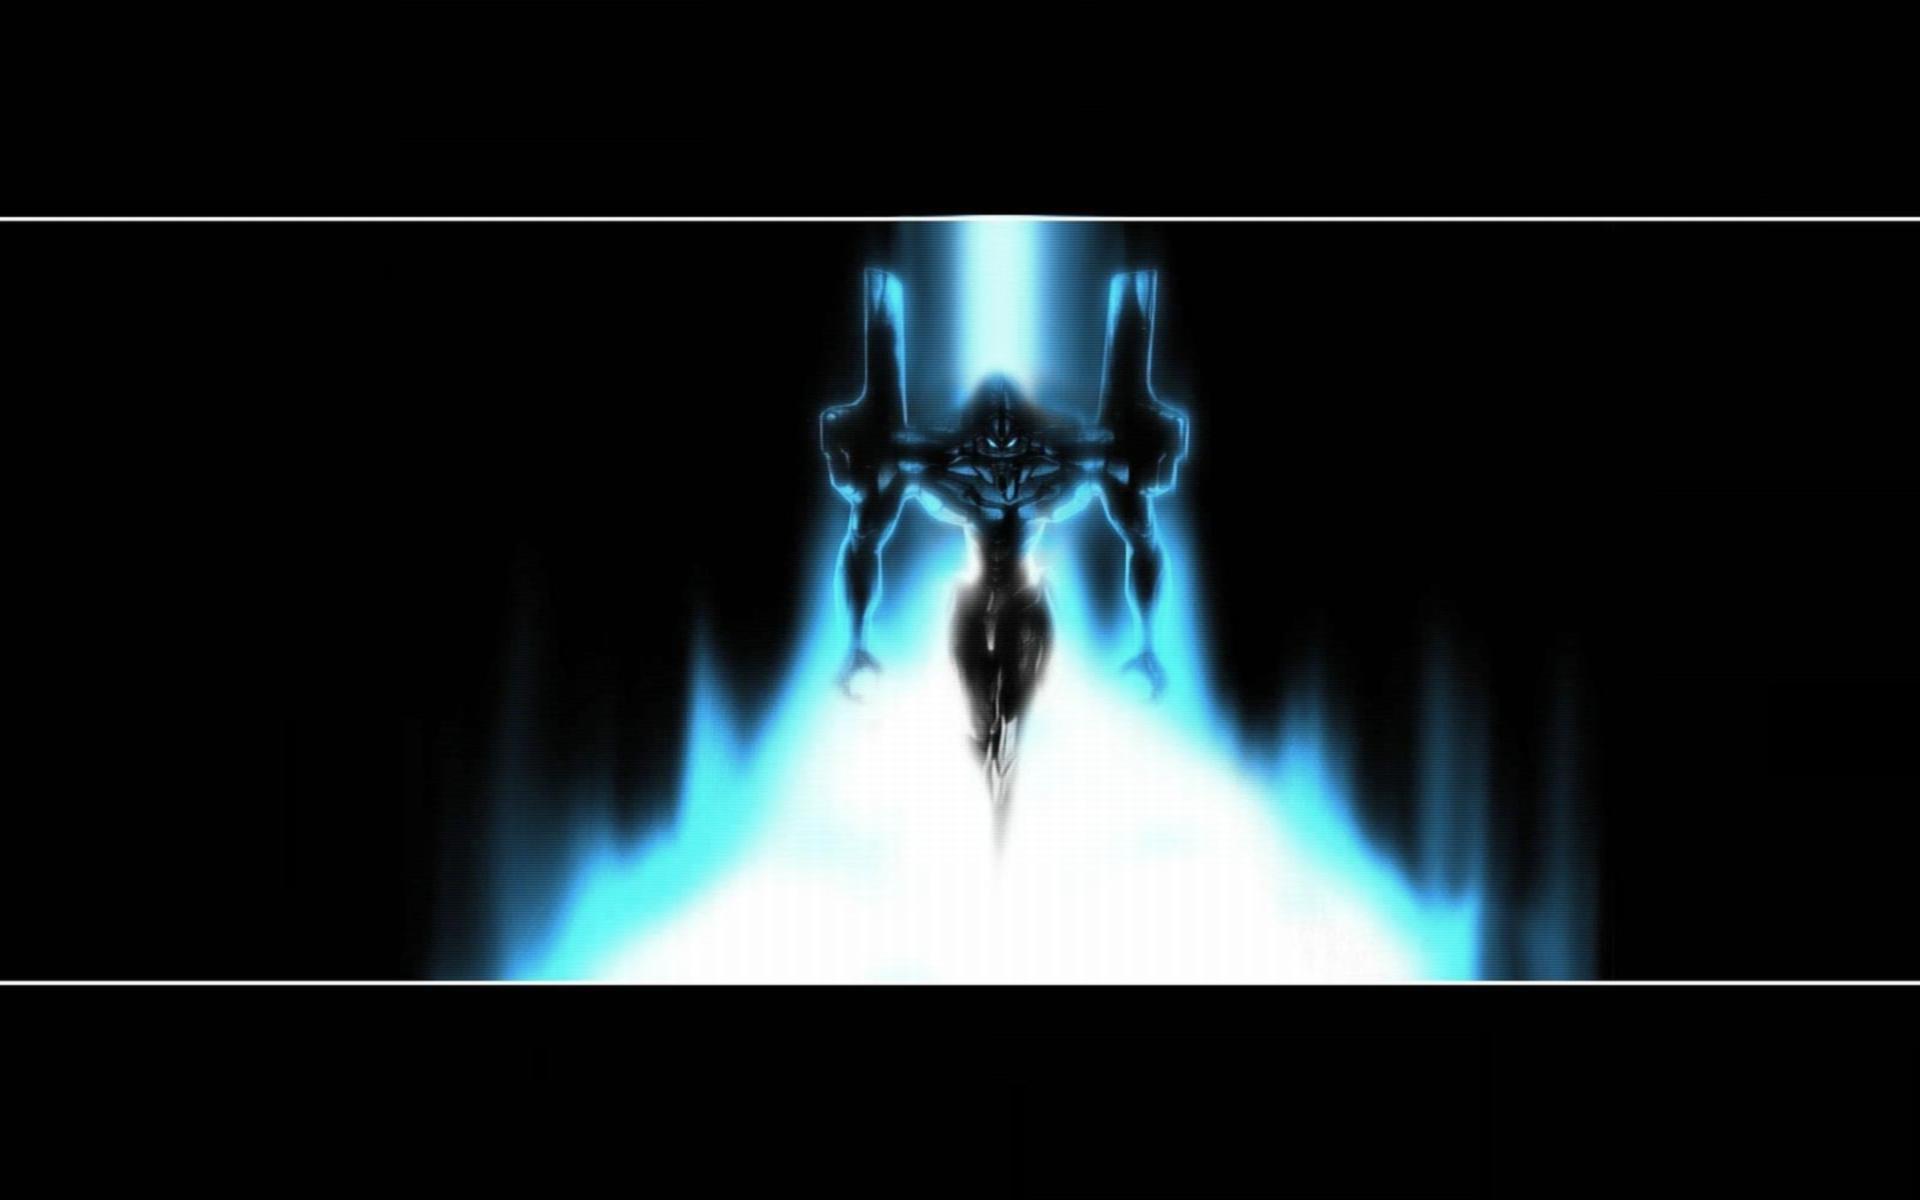 Anime - Neon Genesis Evangelion  - Evangelion Wallpaper